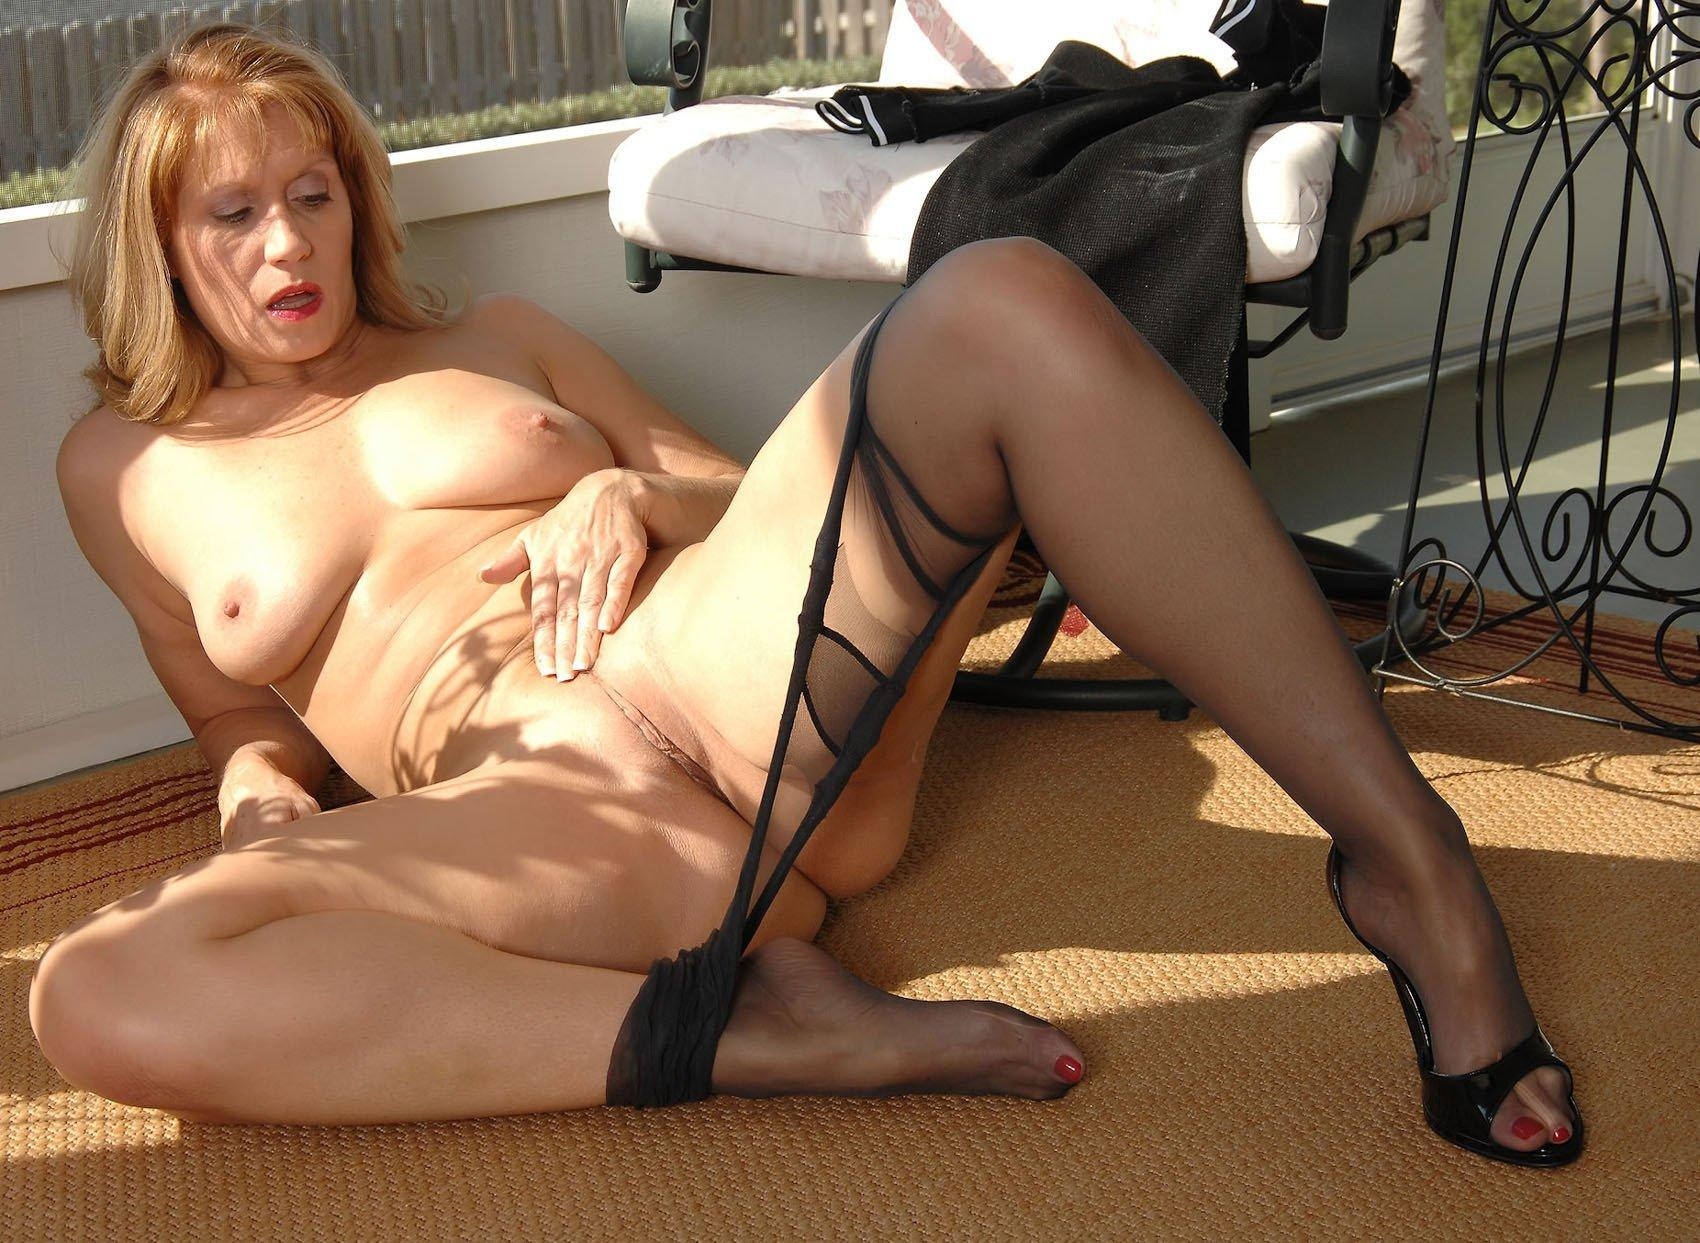 Pictures of female nipple bondage